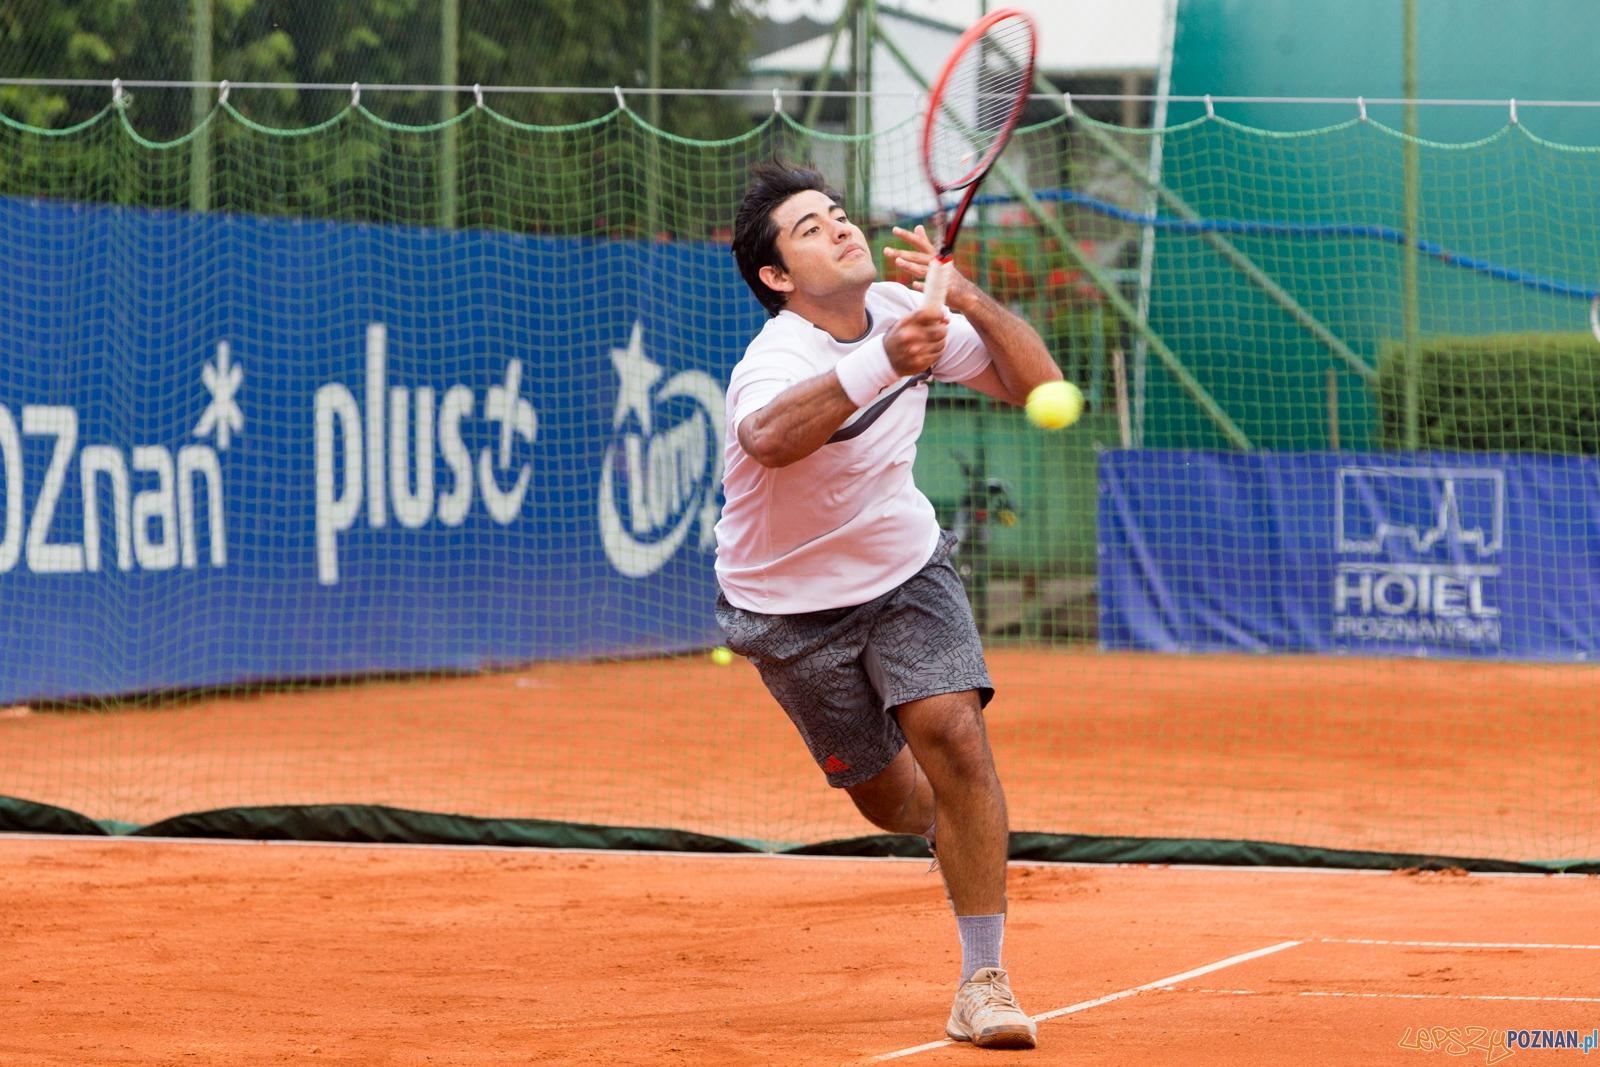 Poznan Open 2015 - Sergio Galdos vs Artem Smirnov  Foto: lepszyPOZNAN.pl / Piotr Rychter